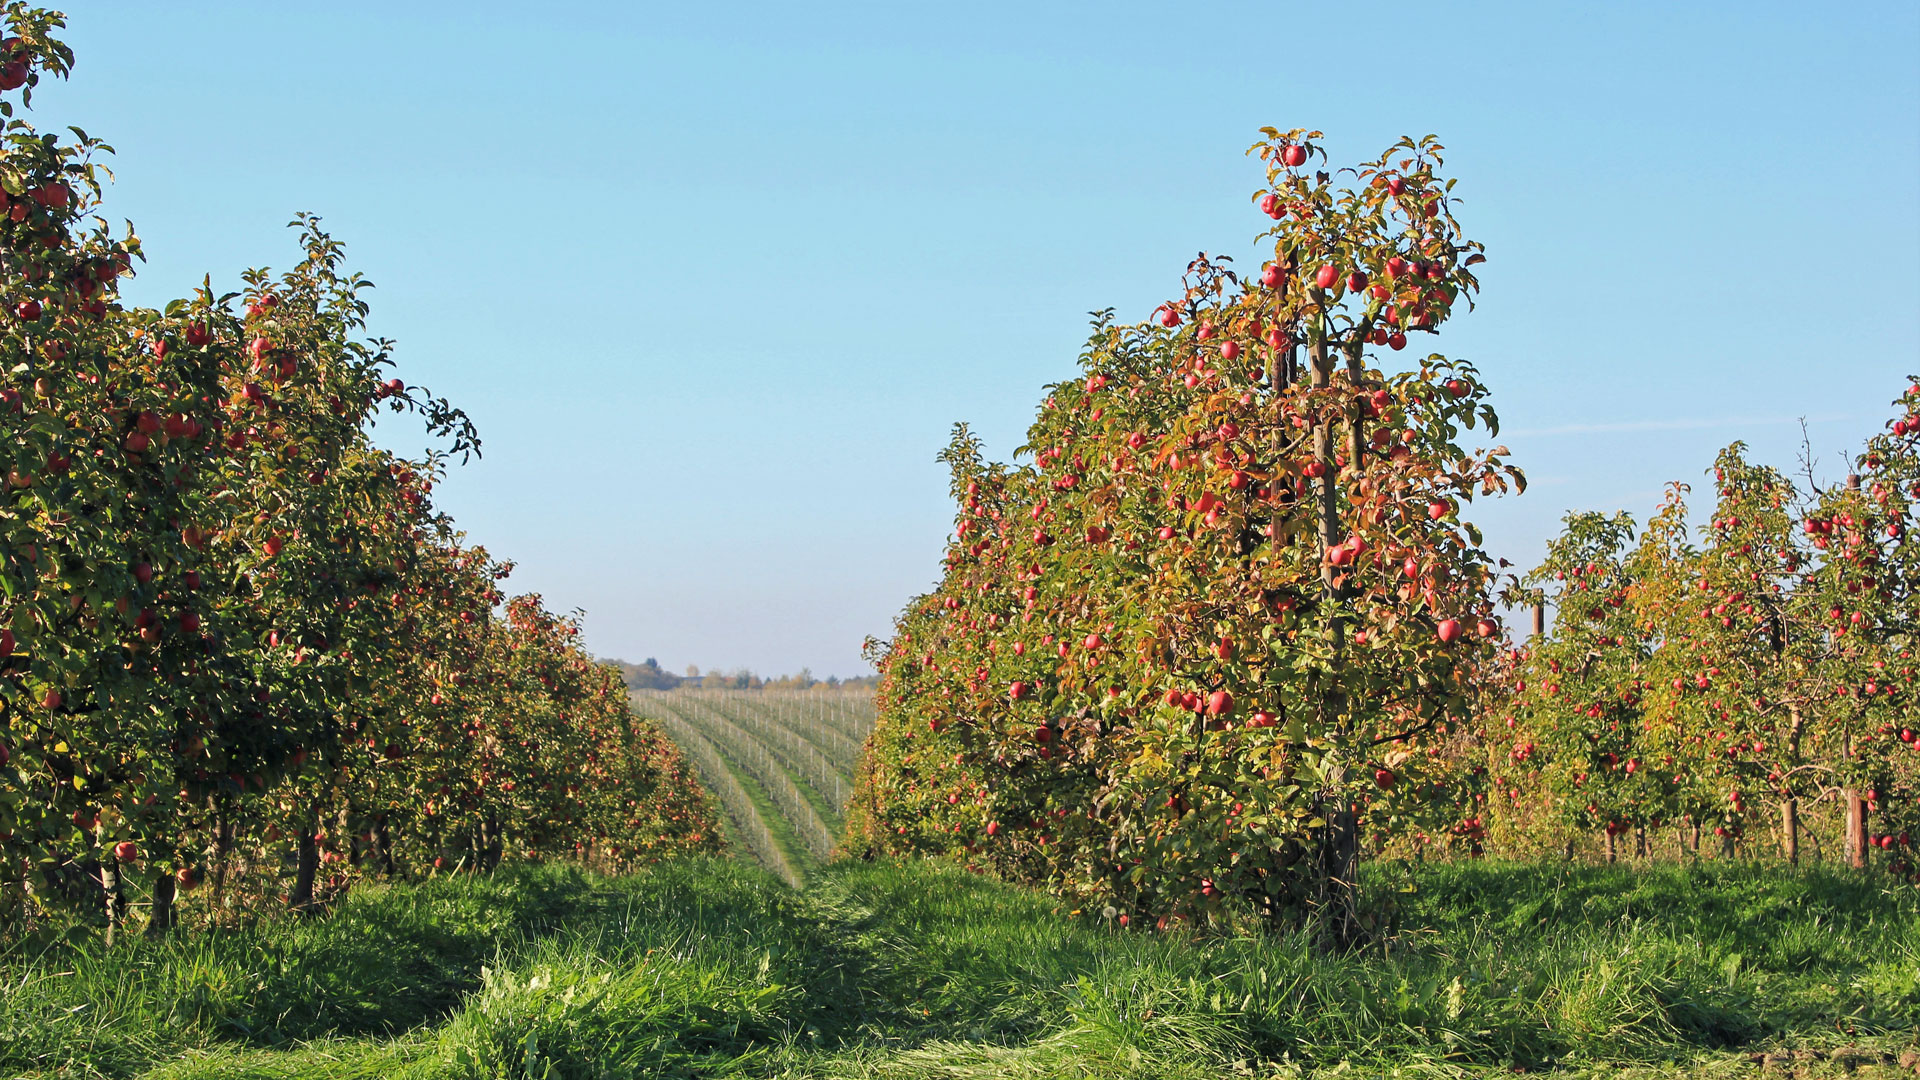 Apfelplantage im Obstland bei Leisnig